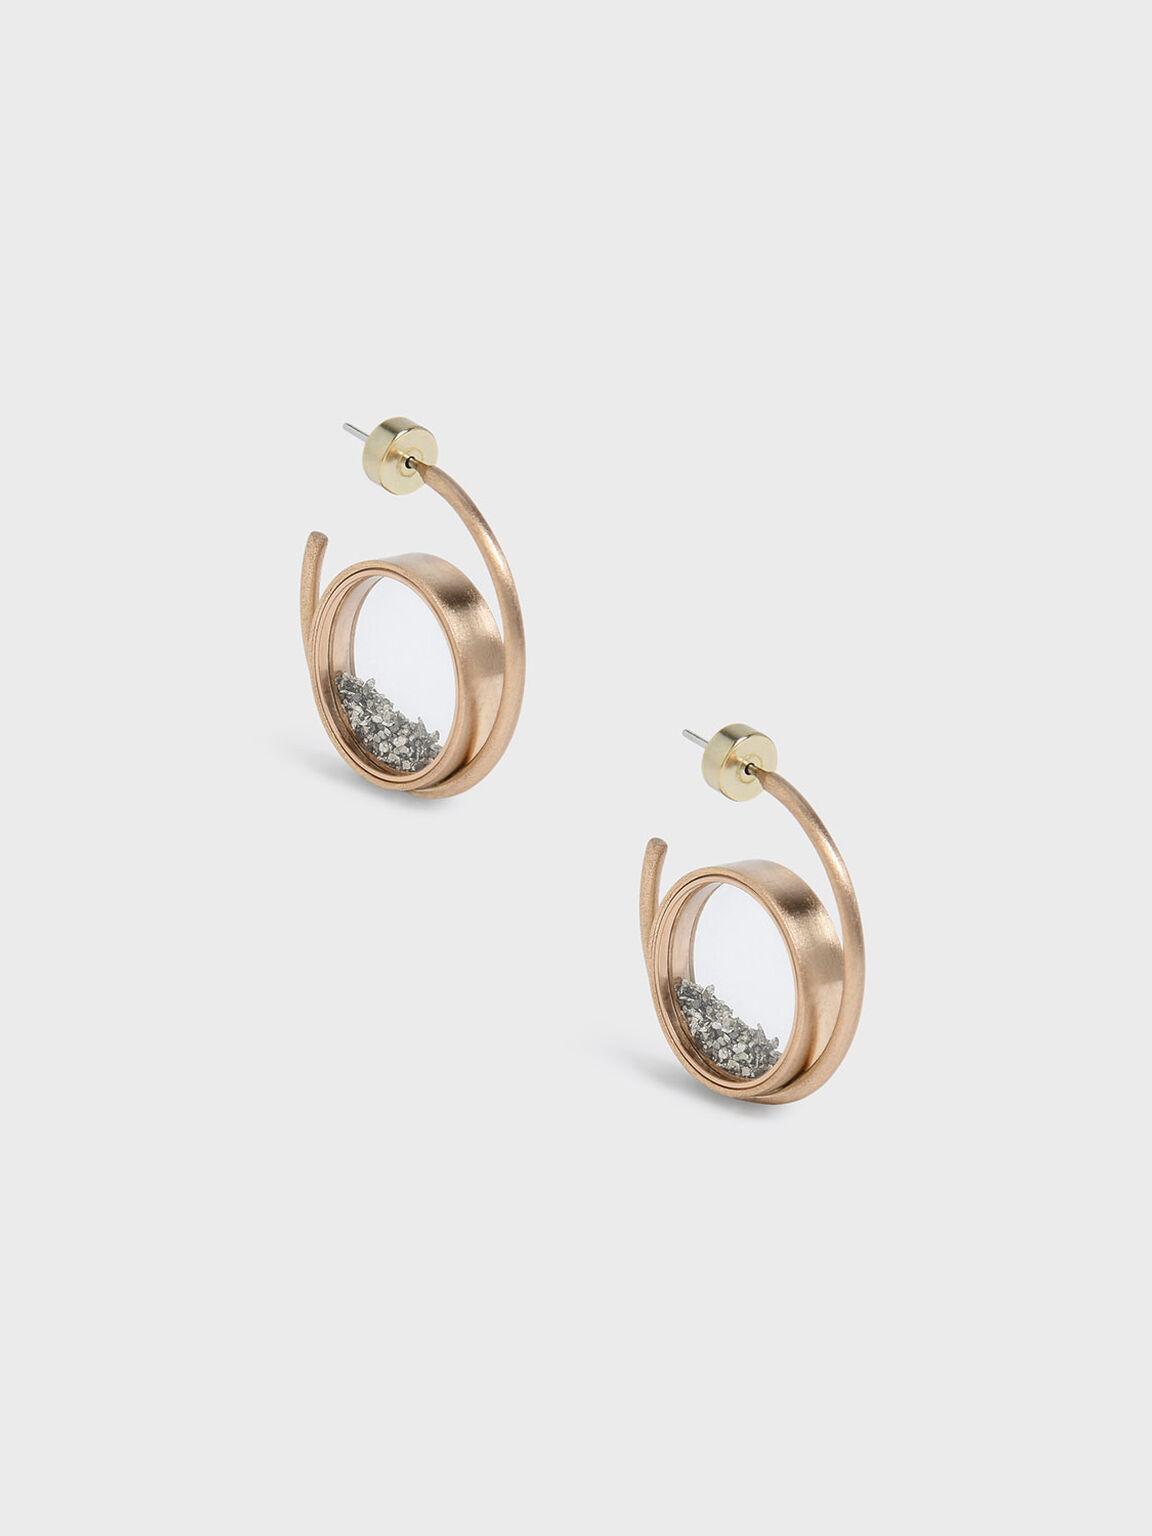 Silver Sparkling Sandstone Floating Locket Hoop Earrings, Gold, hi-res